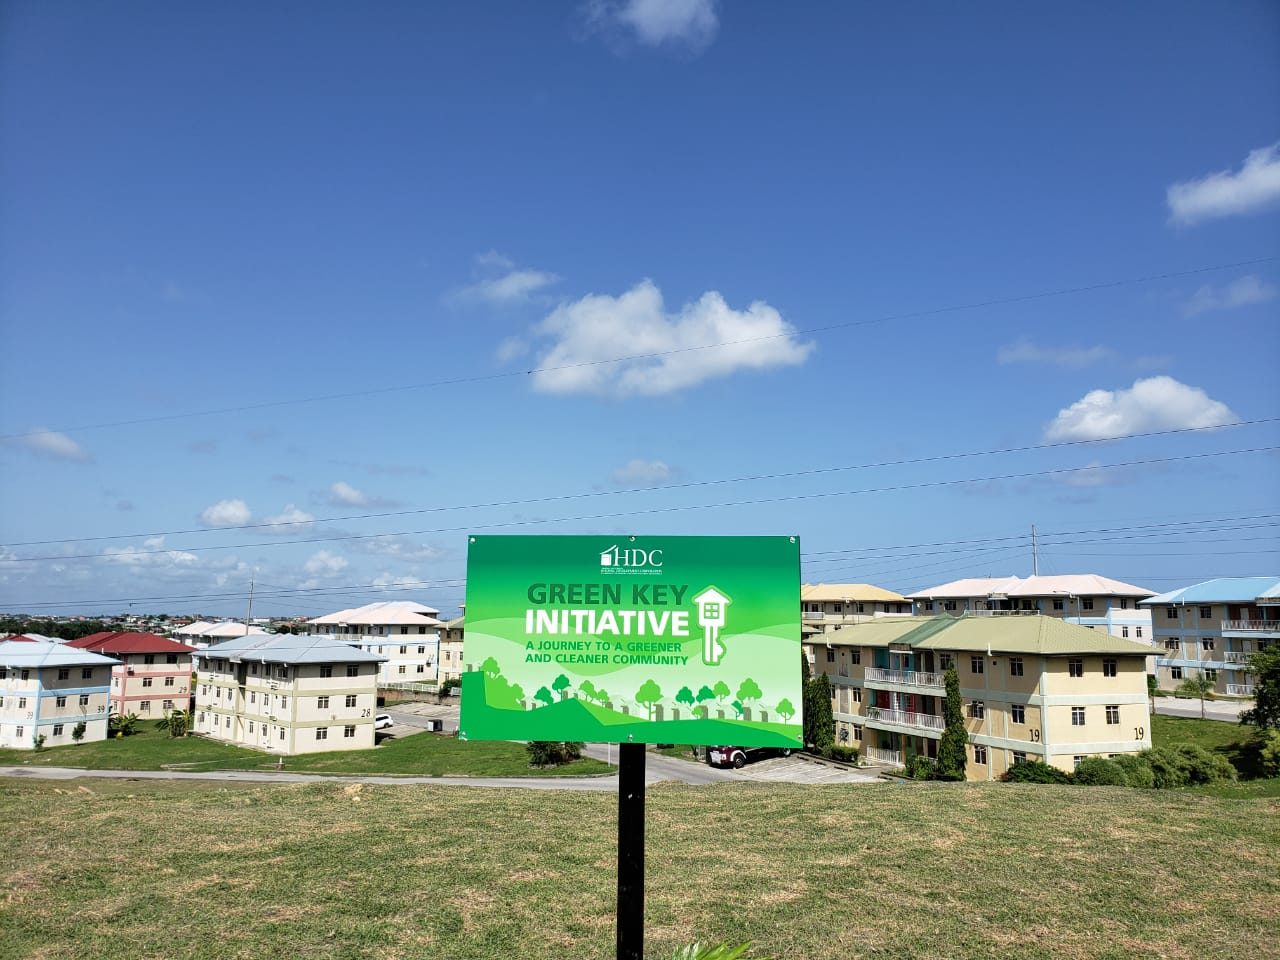 HDC's Green Key Initiative